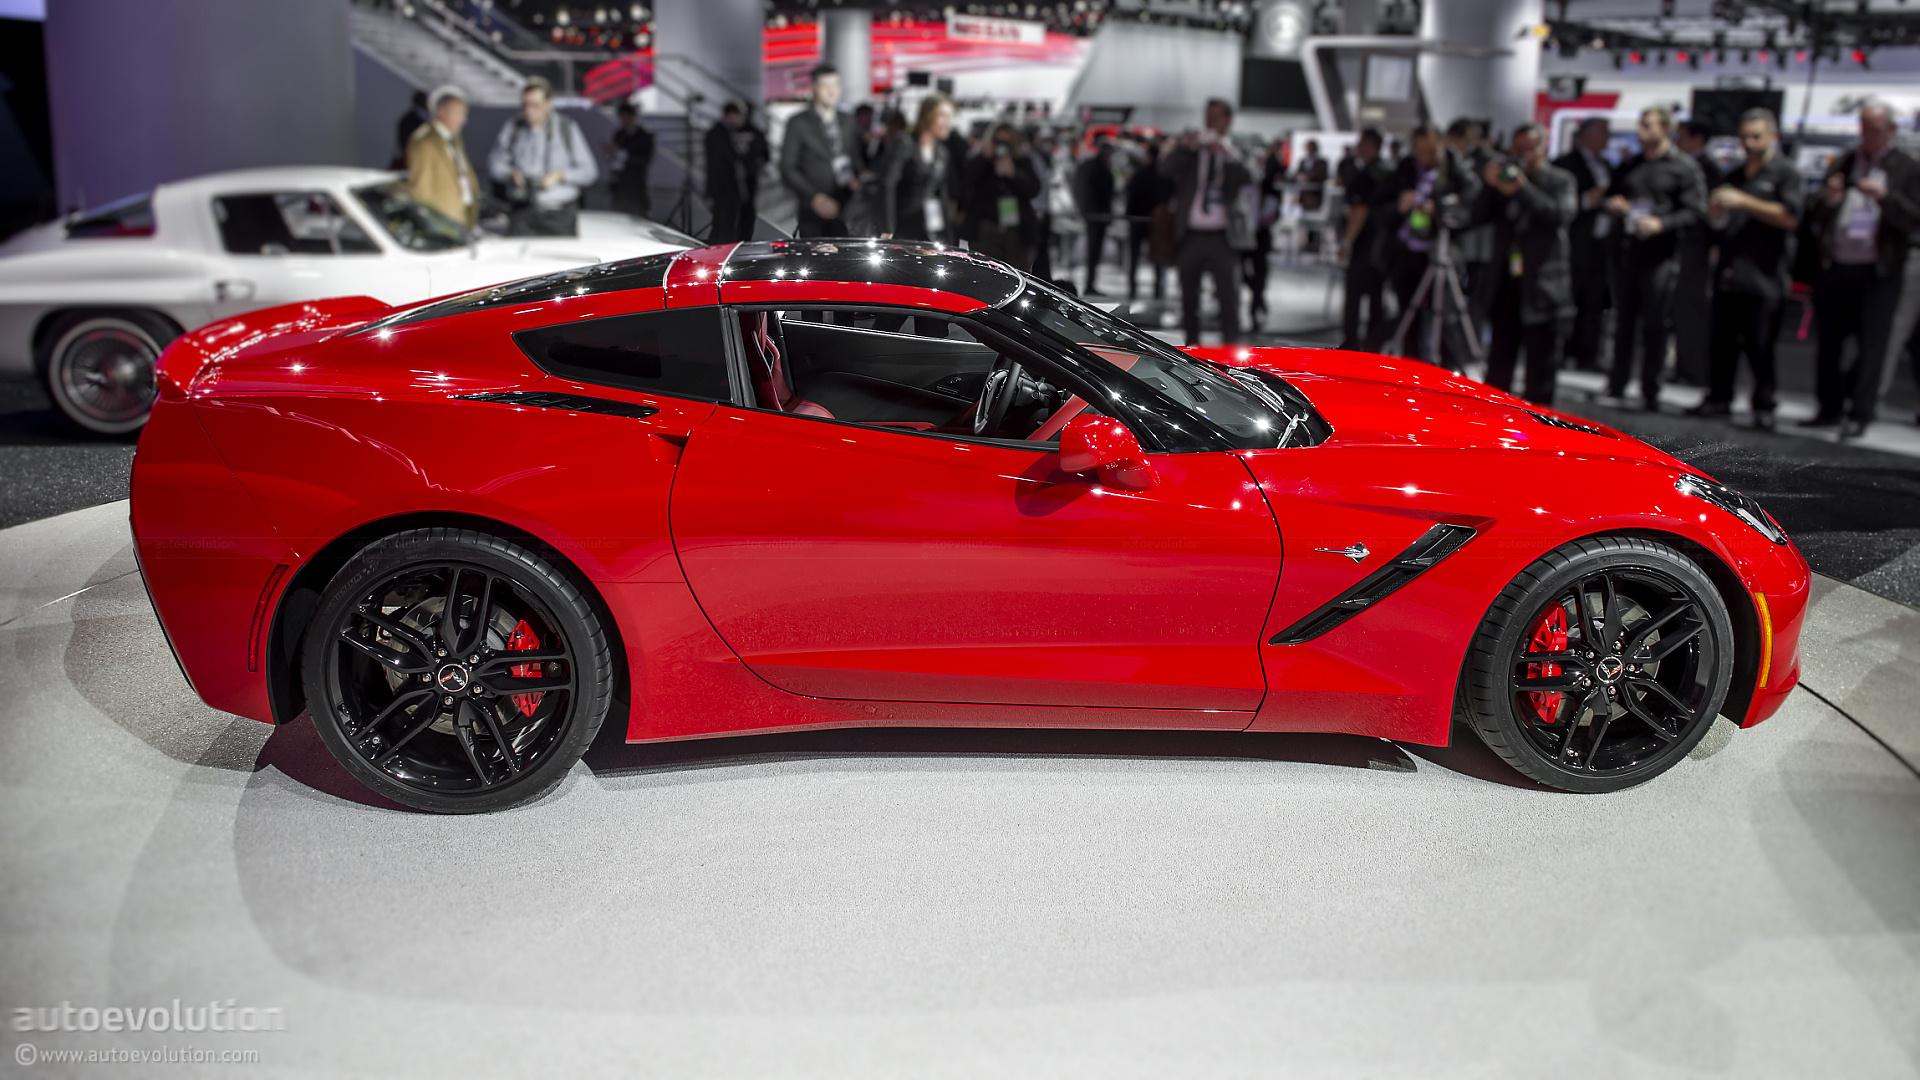 2014 Chevrolet Corvette Stingray US Pricing Announced ...